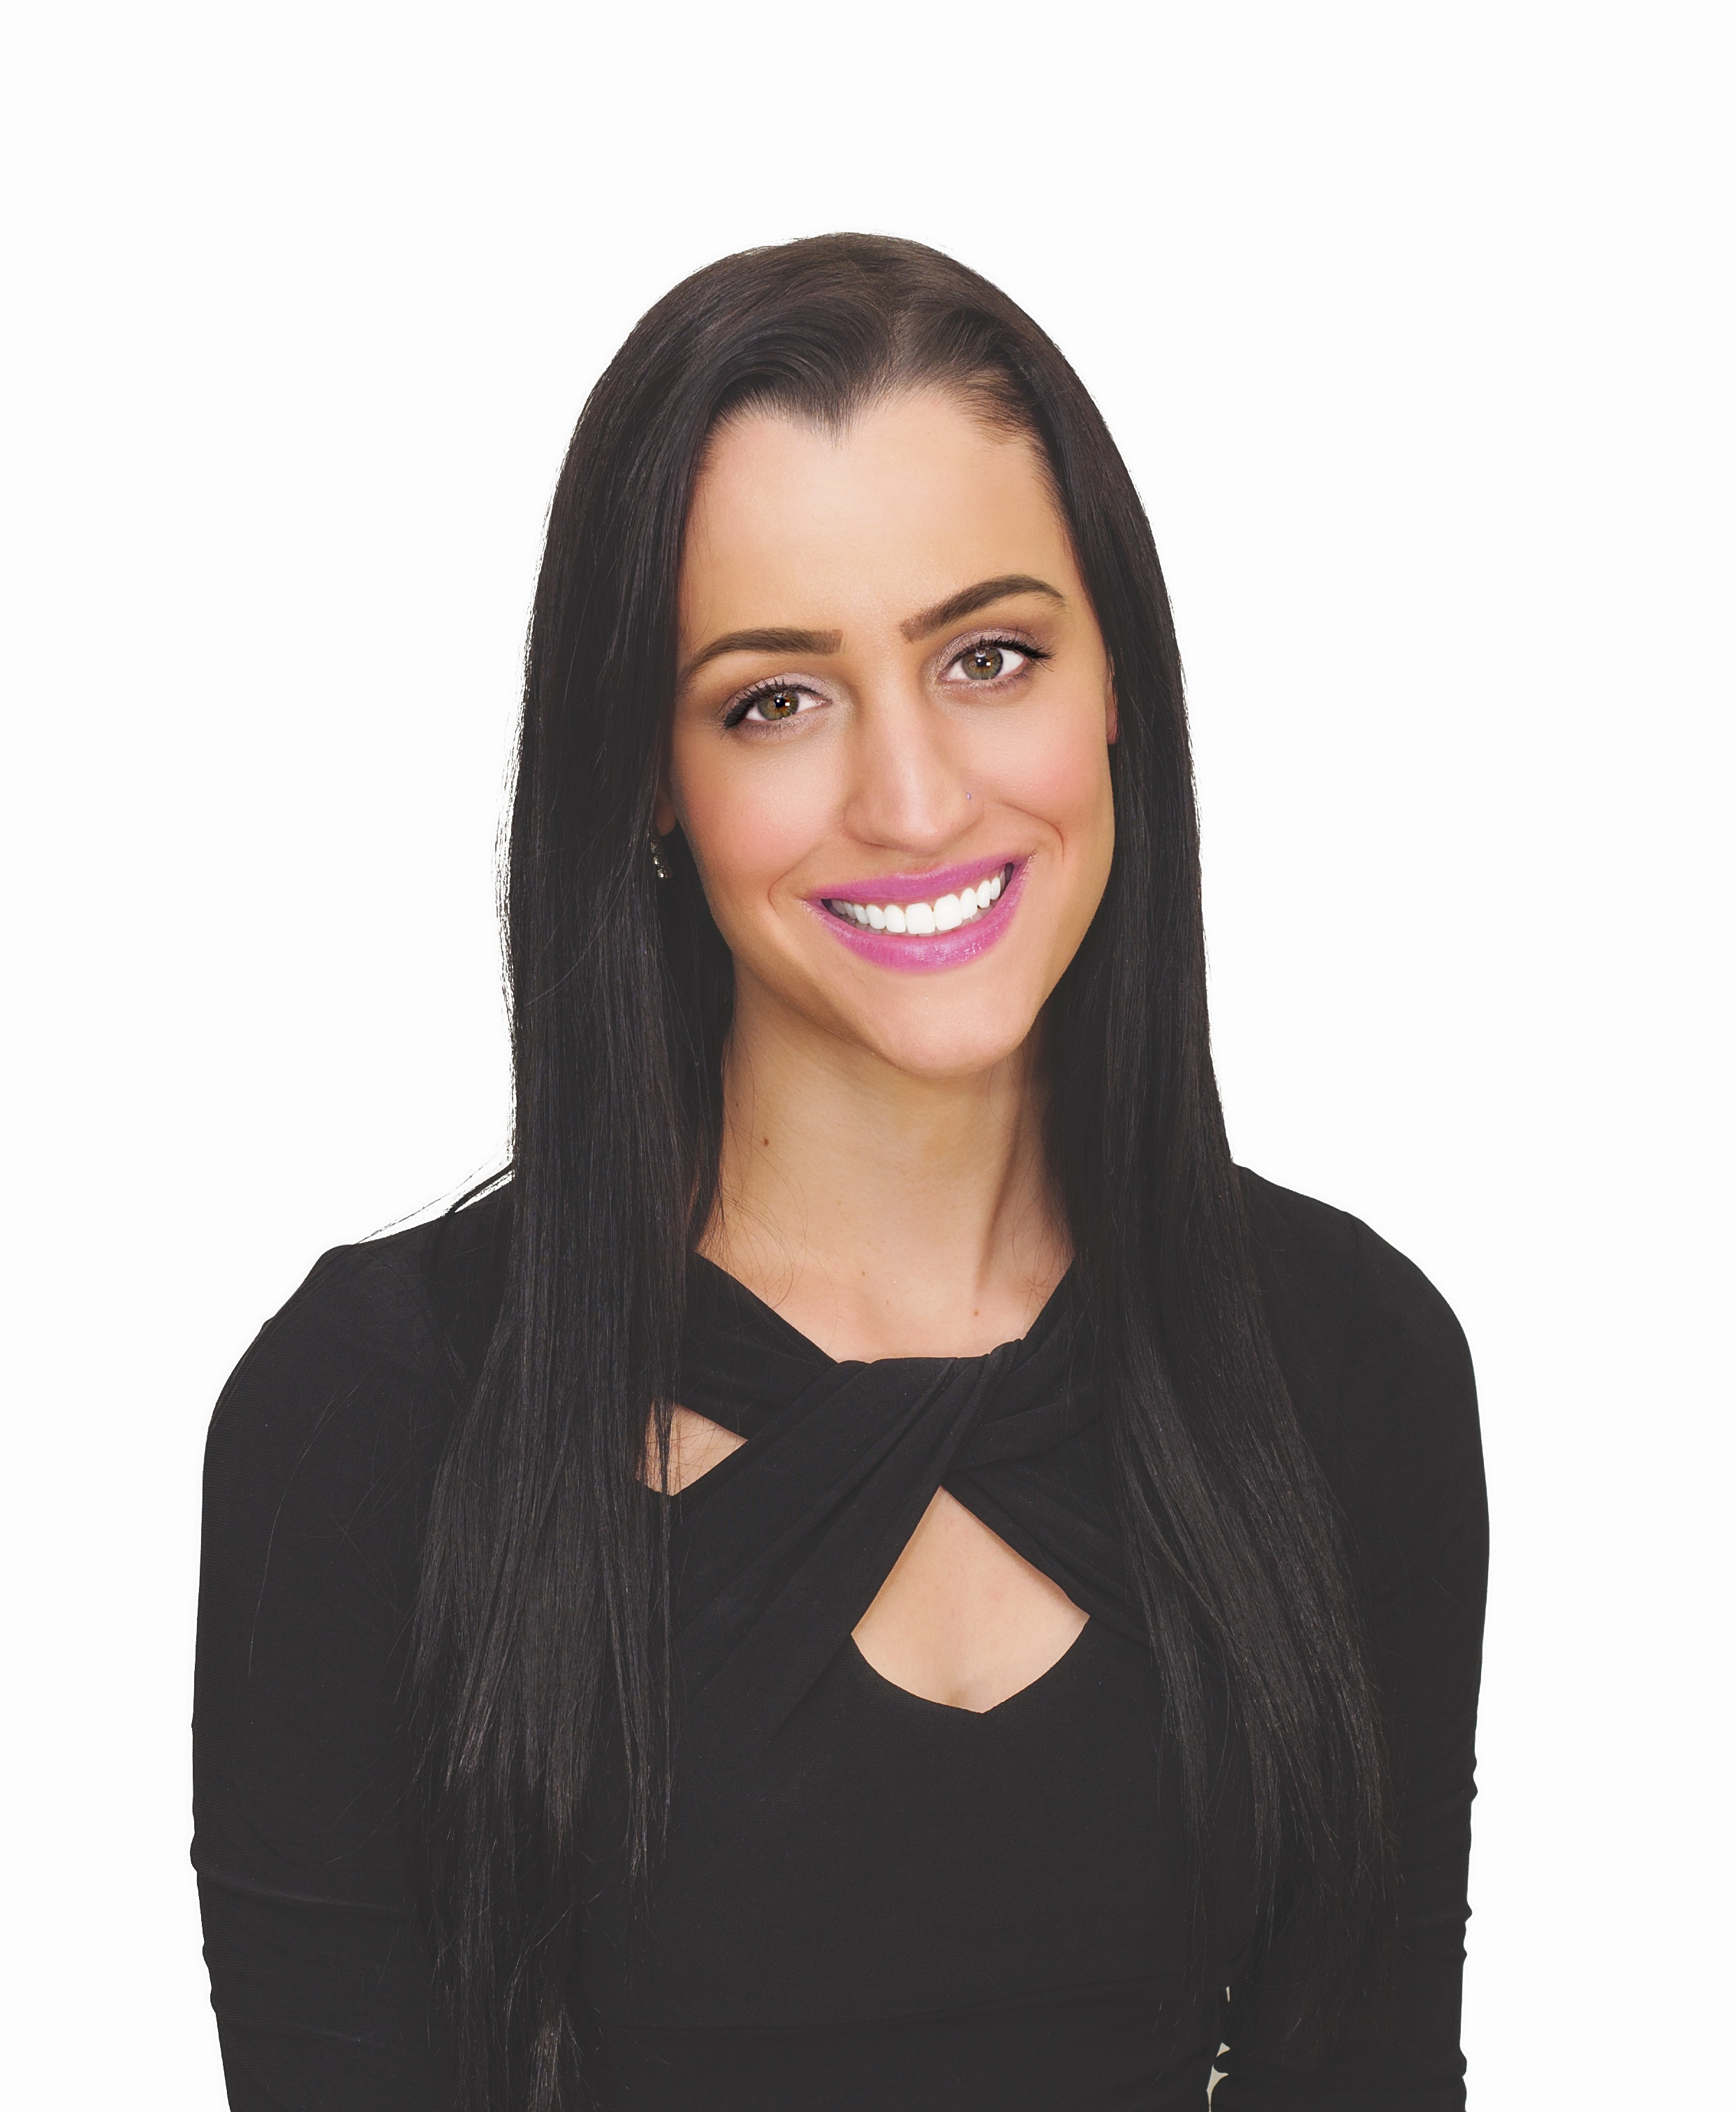 Angela Garner